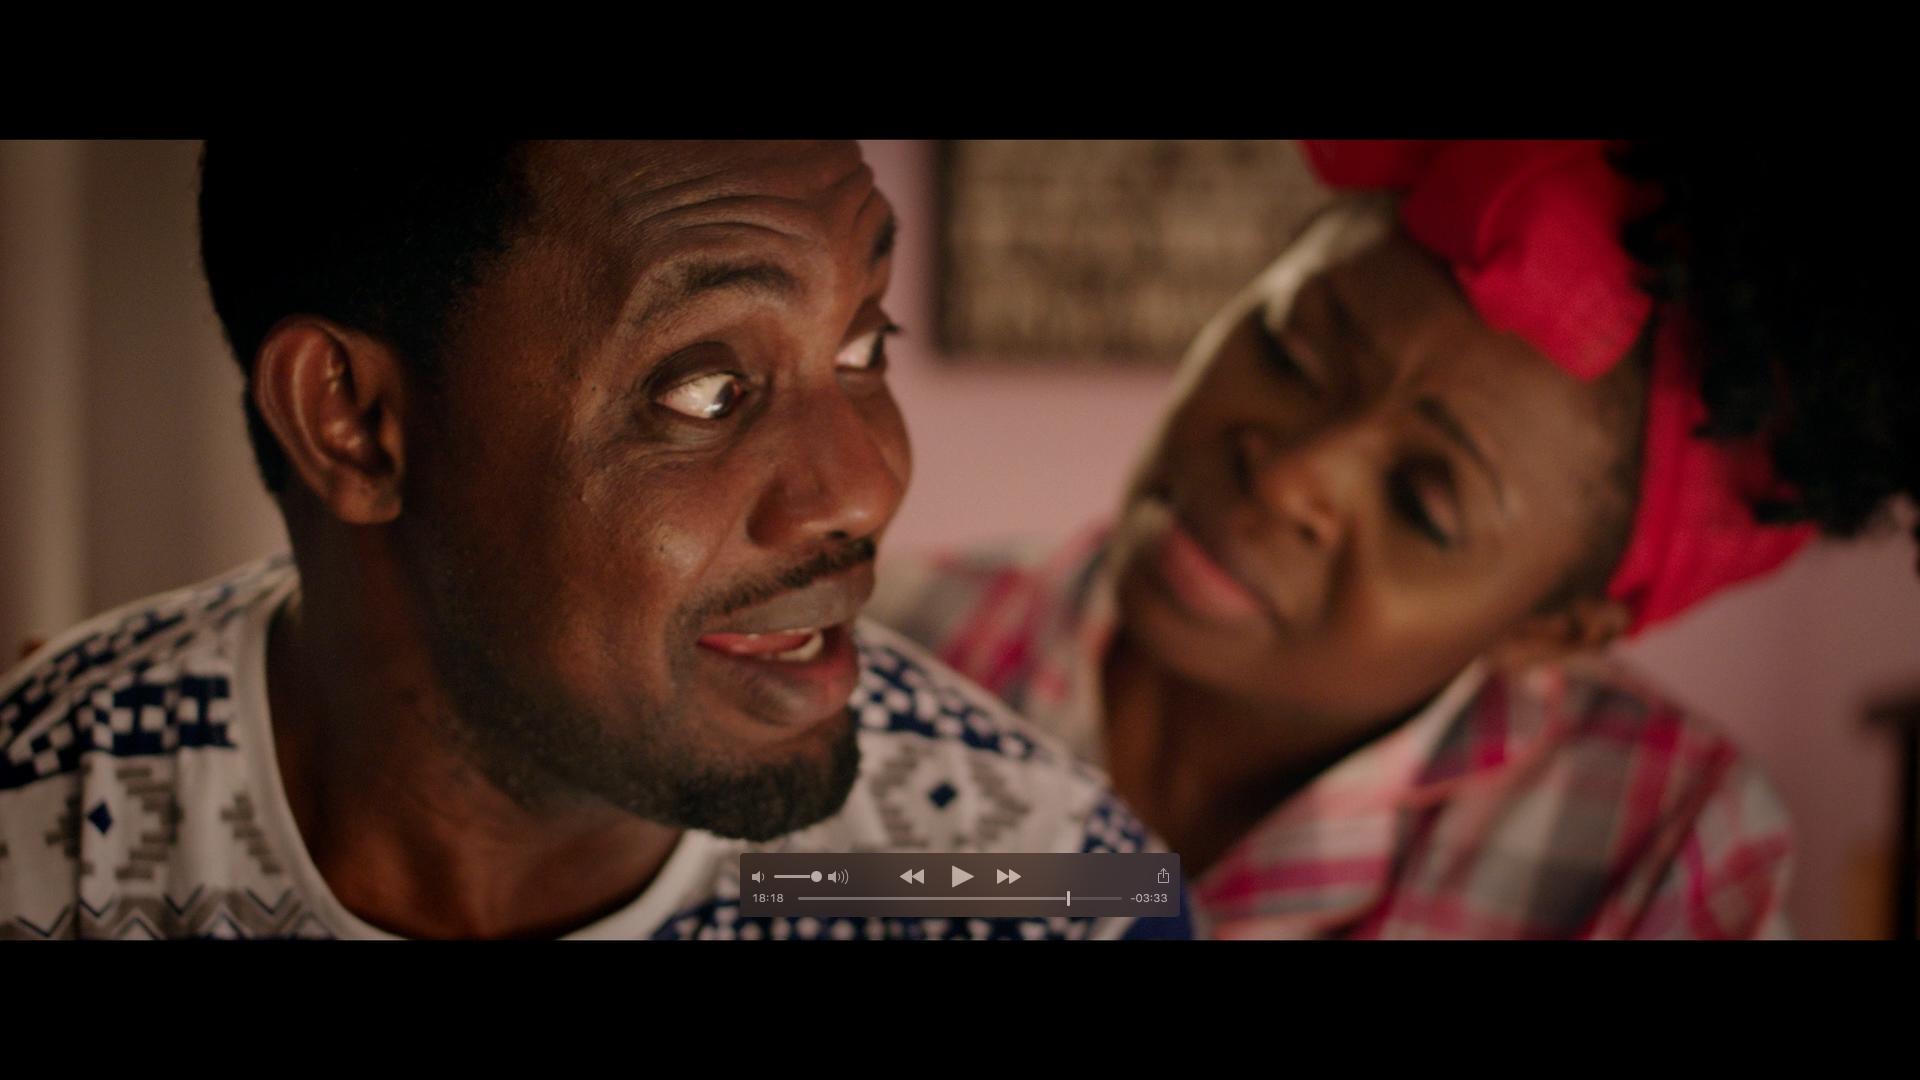 Lodgers wins 'best short film' @ Africa International Film Festival (AFRIFF)